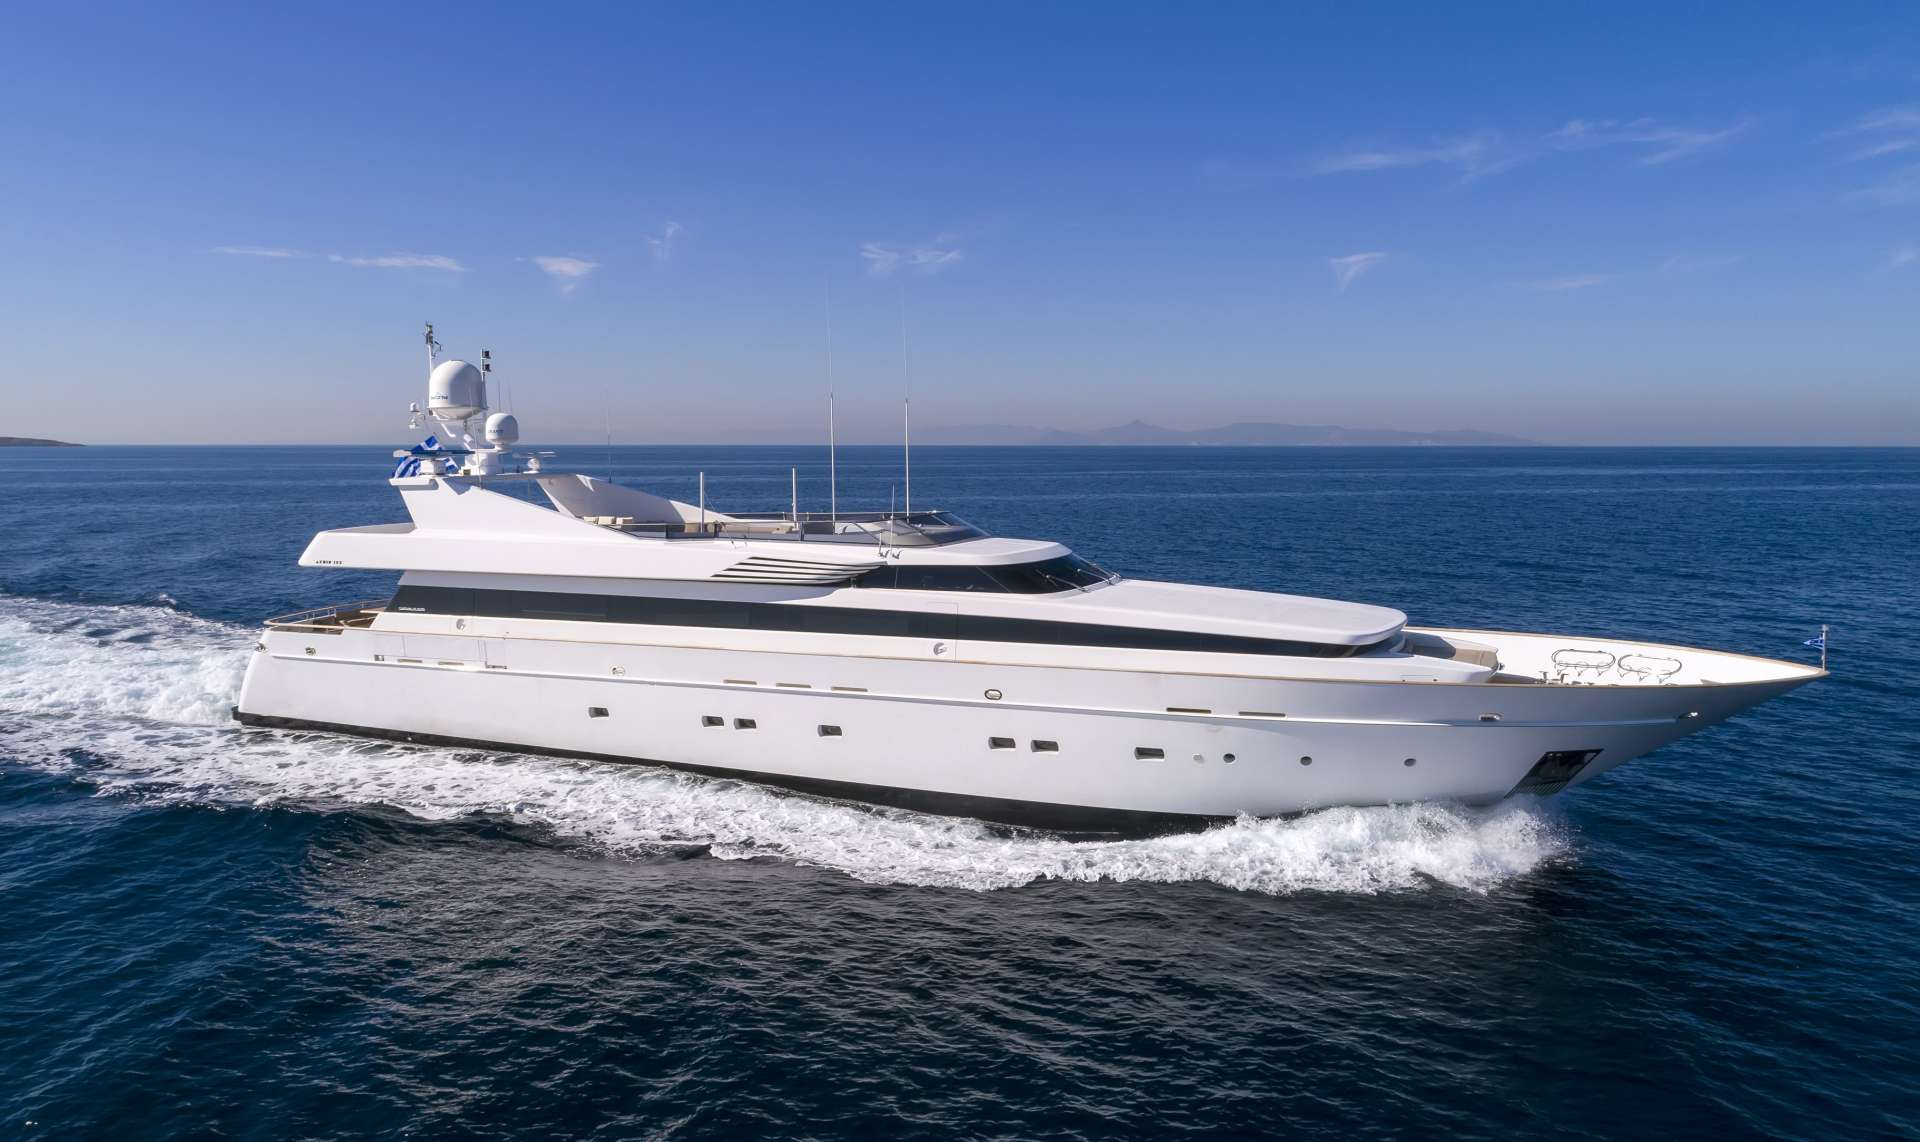 Power Yacht 'Power', 12 PAX, 8 Crew, 130.00 Ft, 39.00 Meters, Built 2004, Cantieri di Pisa, Italy, Refit Year 2010